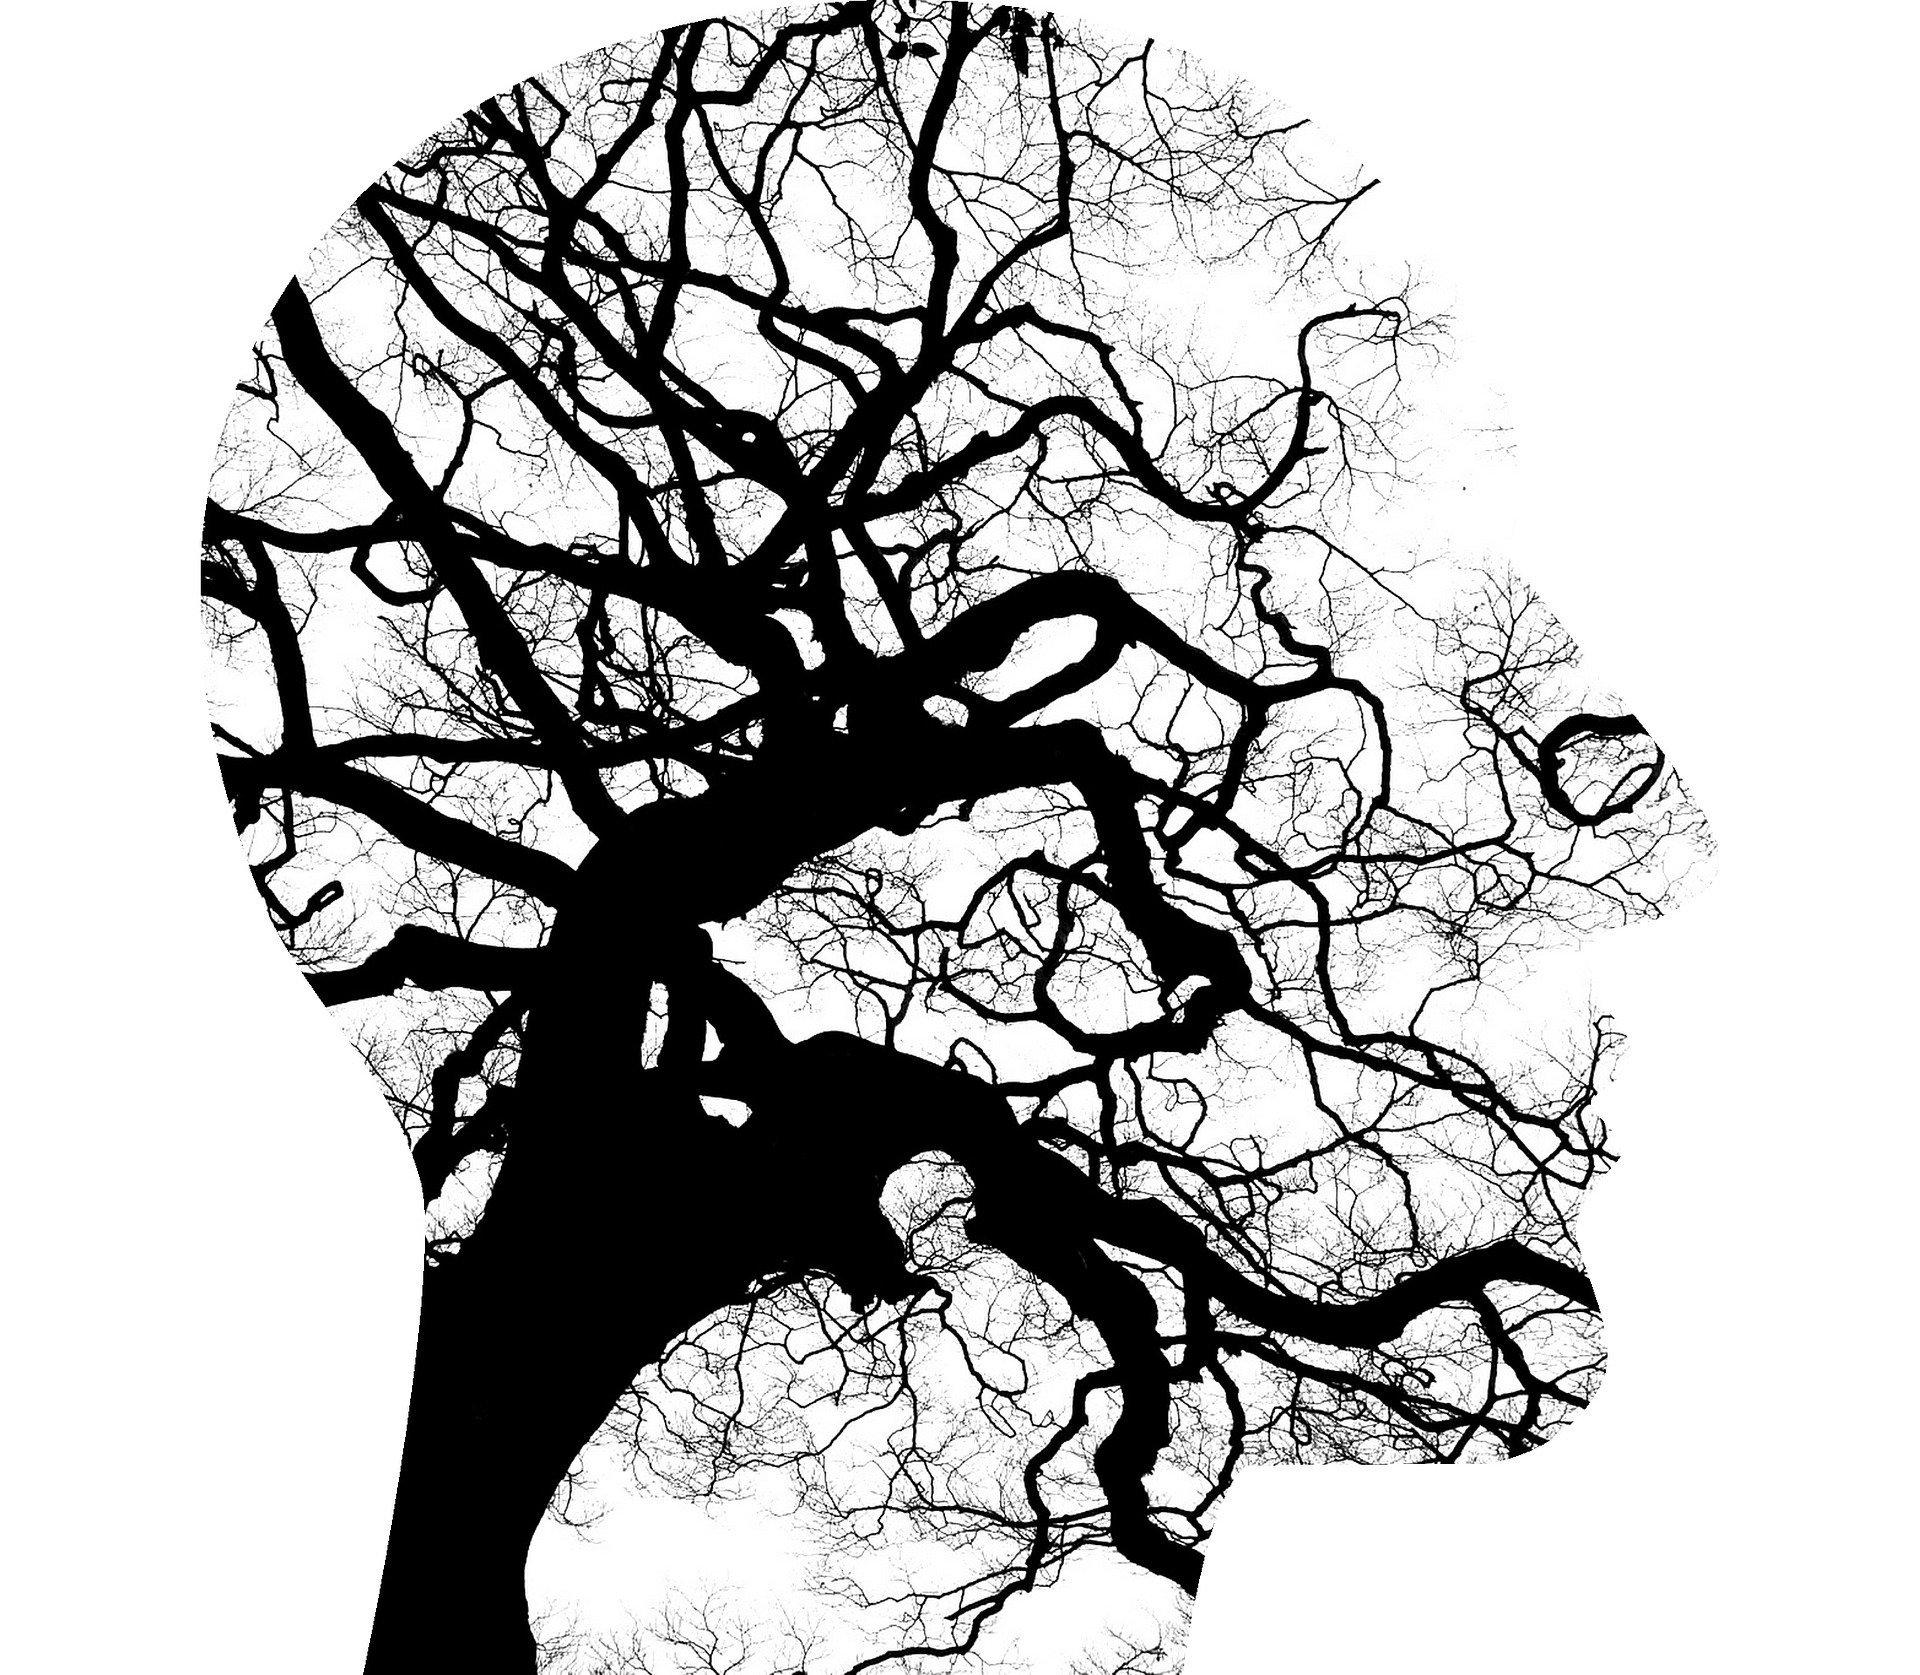 psicologo - tipologie